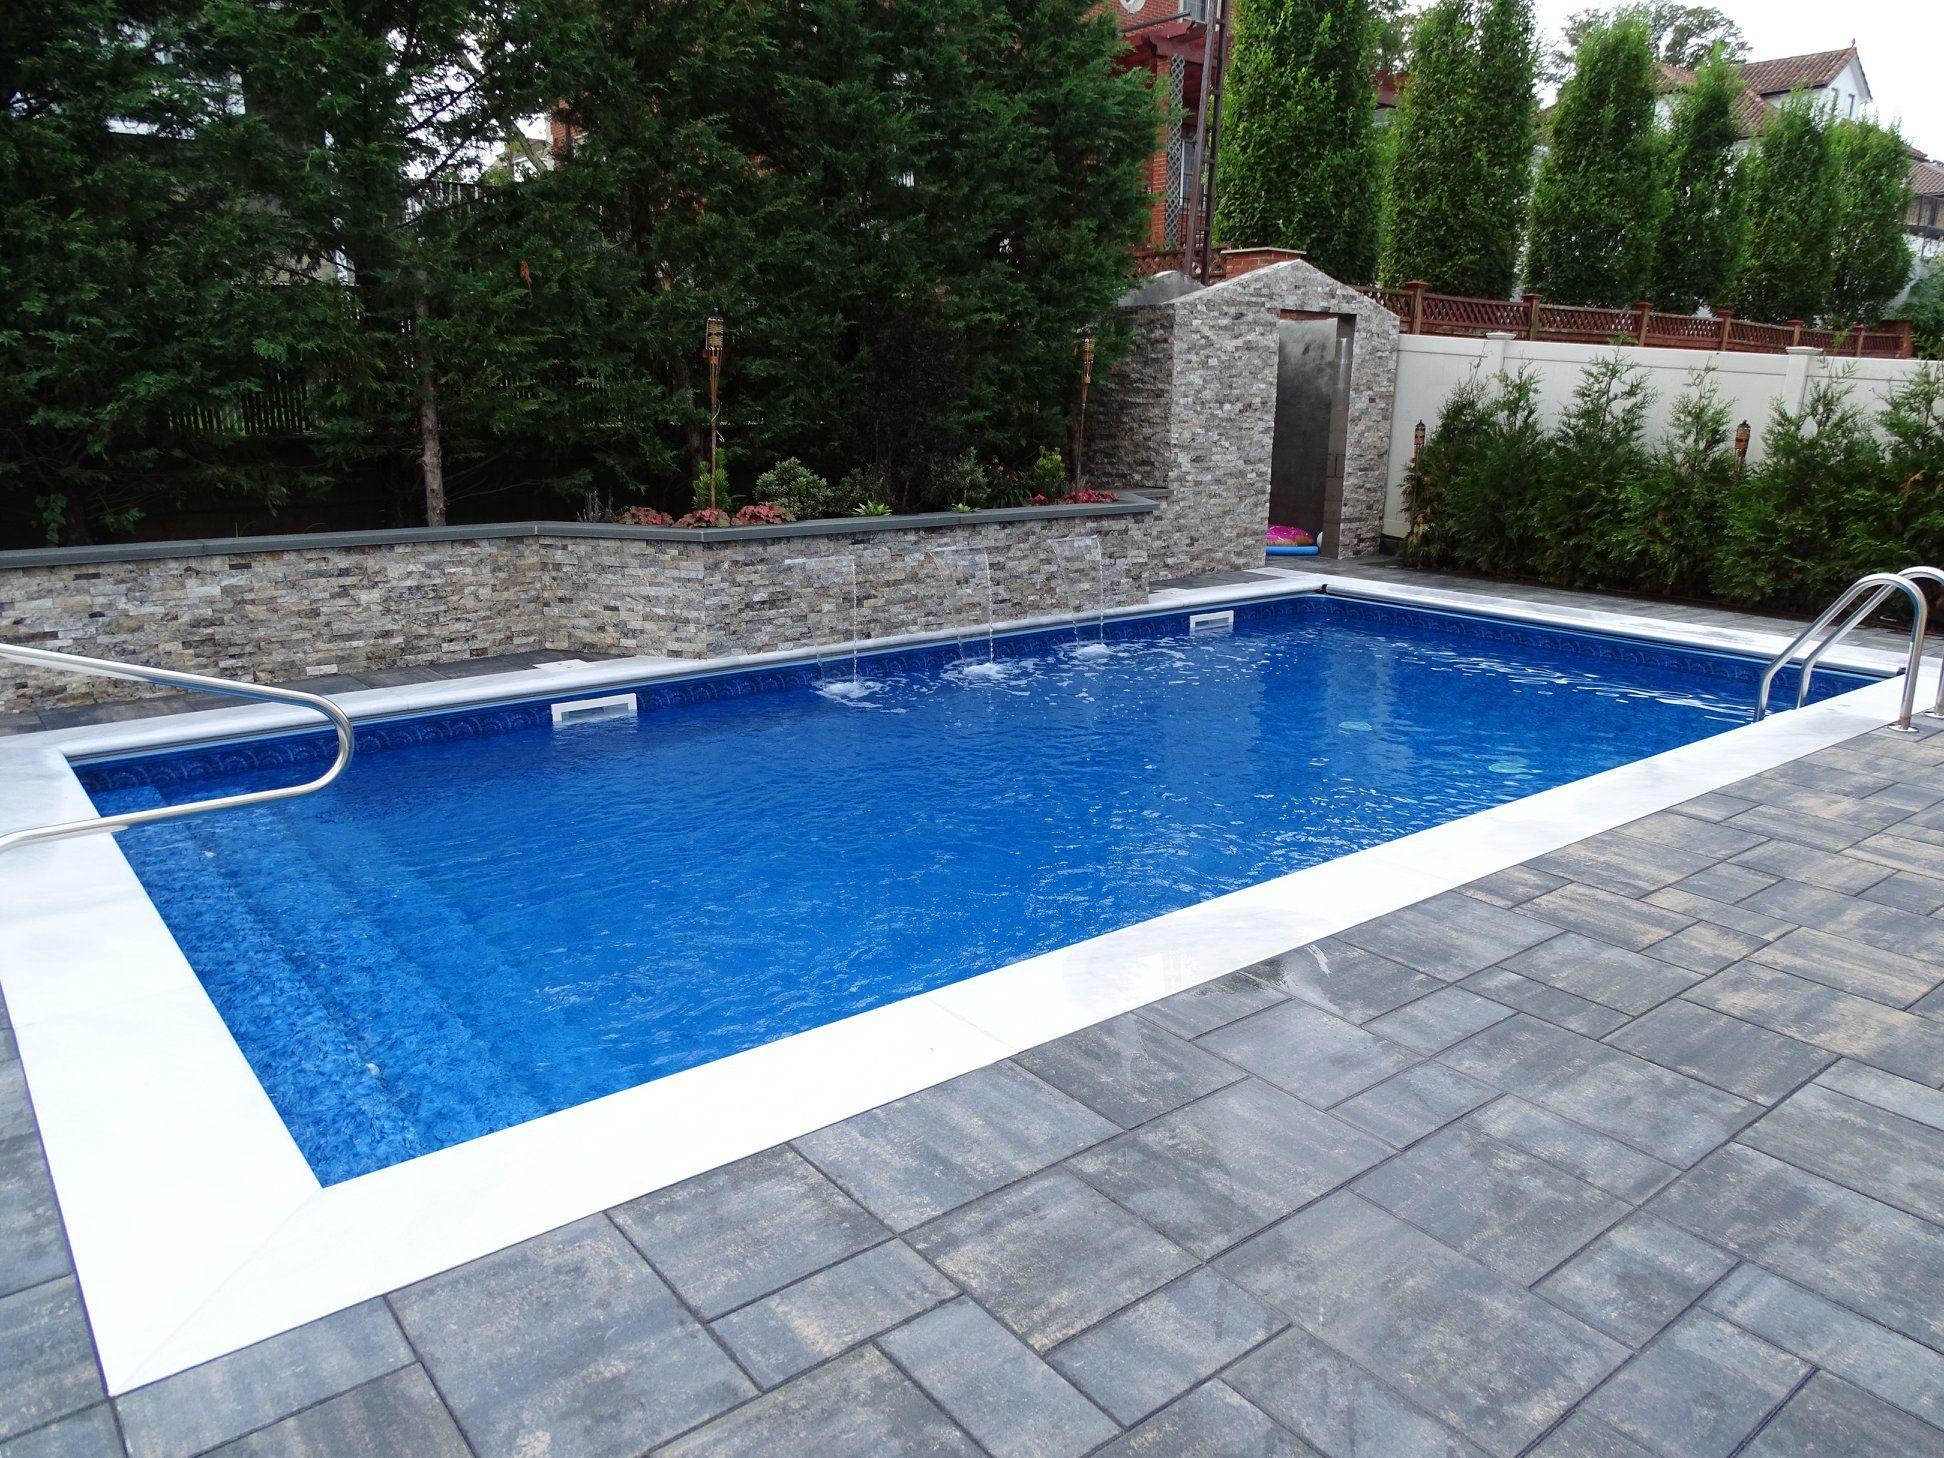 Inground Pool With 3 Sheer Descent Waterfalls Pool Houses Pool Installation Backyard Pool